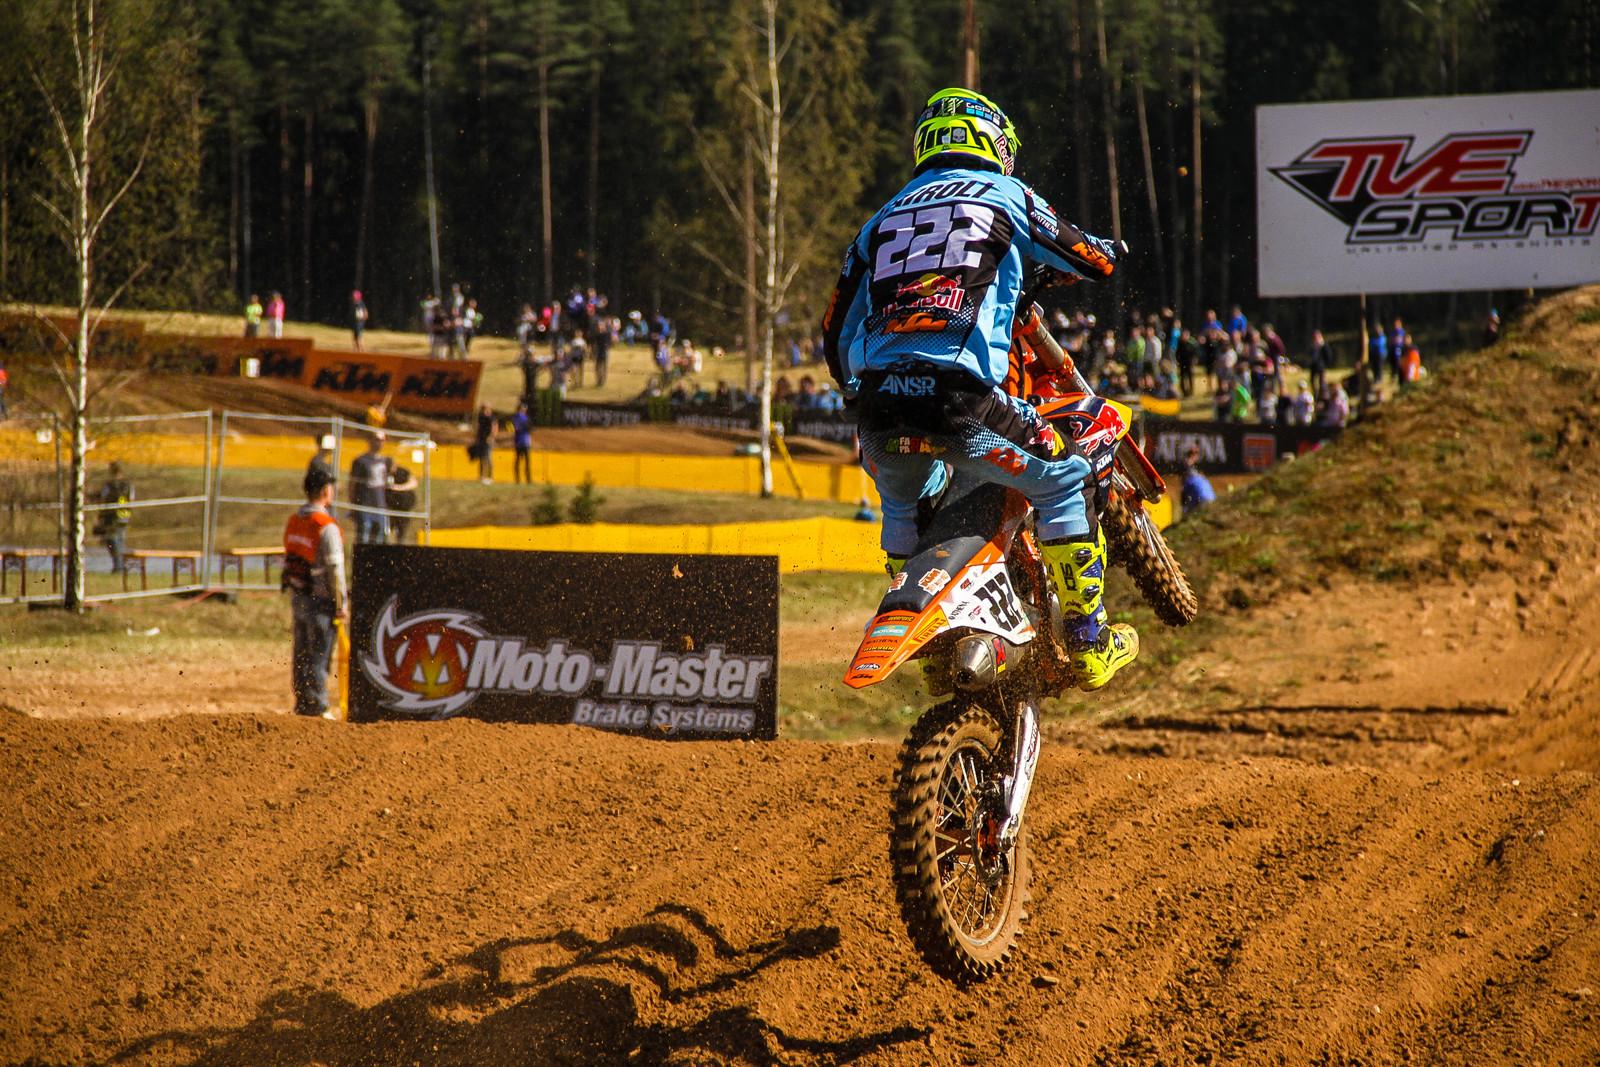 Antonio Cairoli - Photo Blast: 2017 MXGP of Latvia - Motocross Pictures - Vital MX